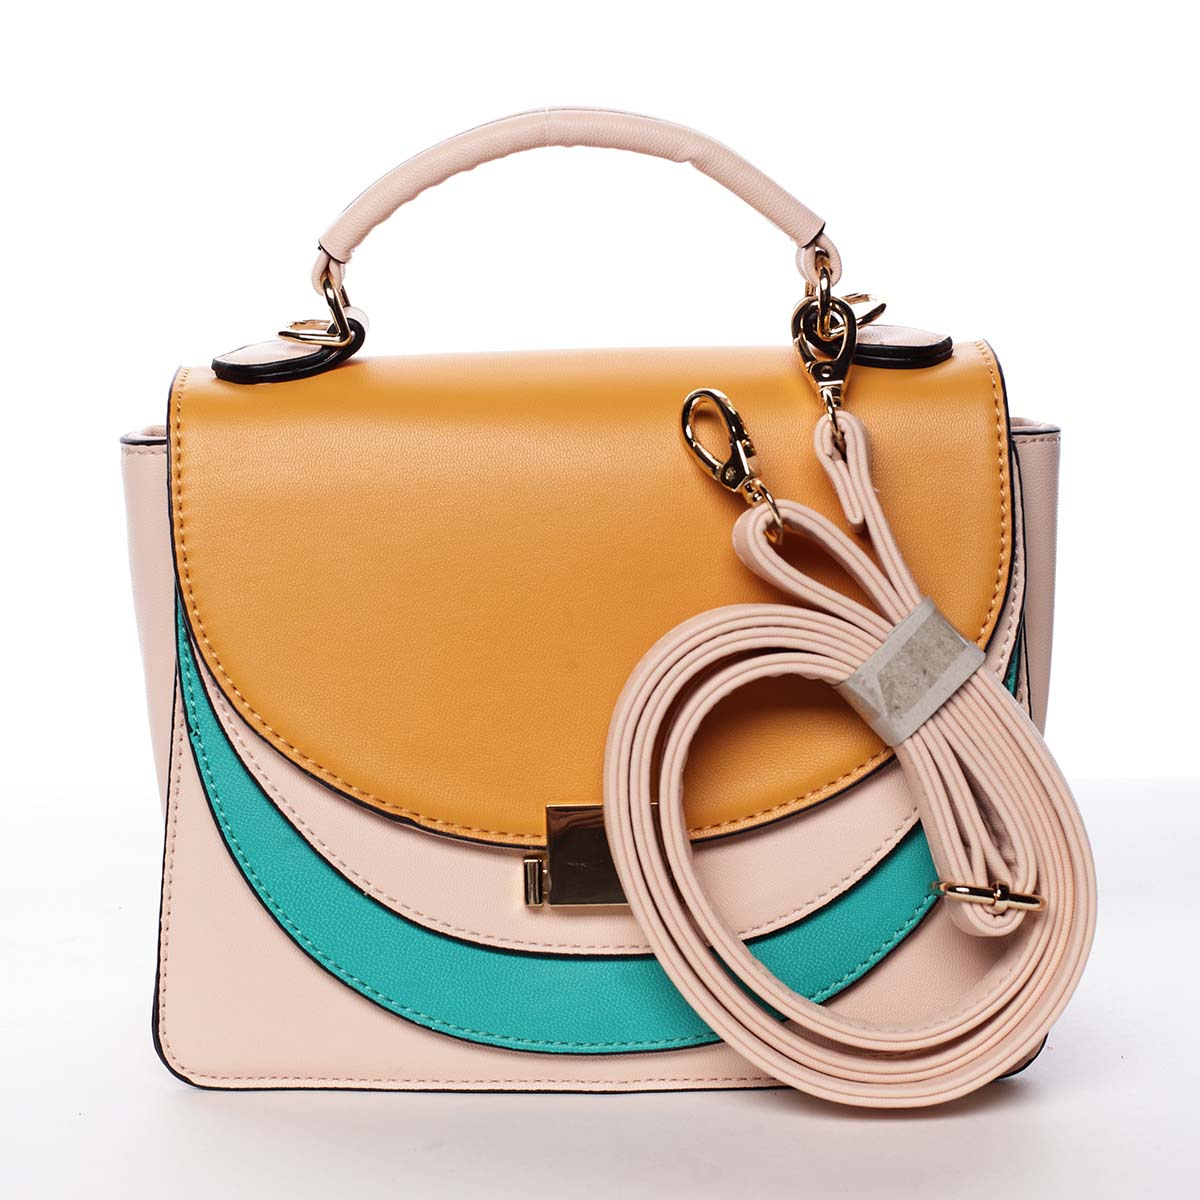 Originální malá dámská kabelka růžová - Dudlin Sandra